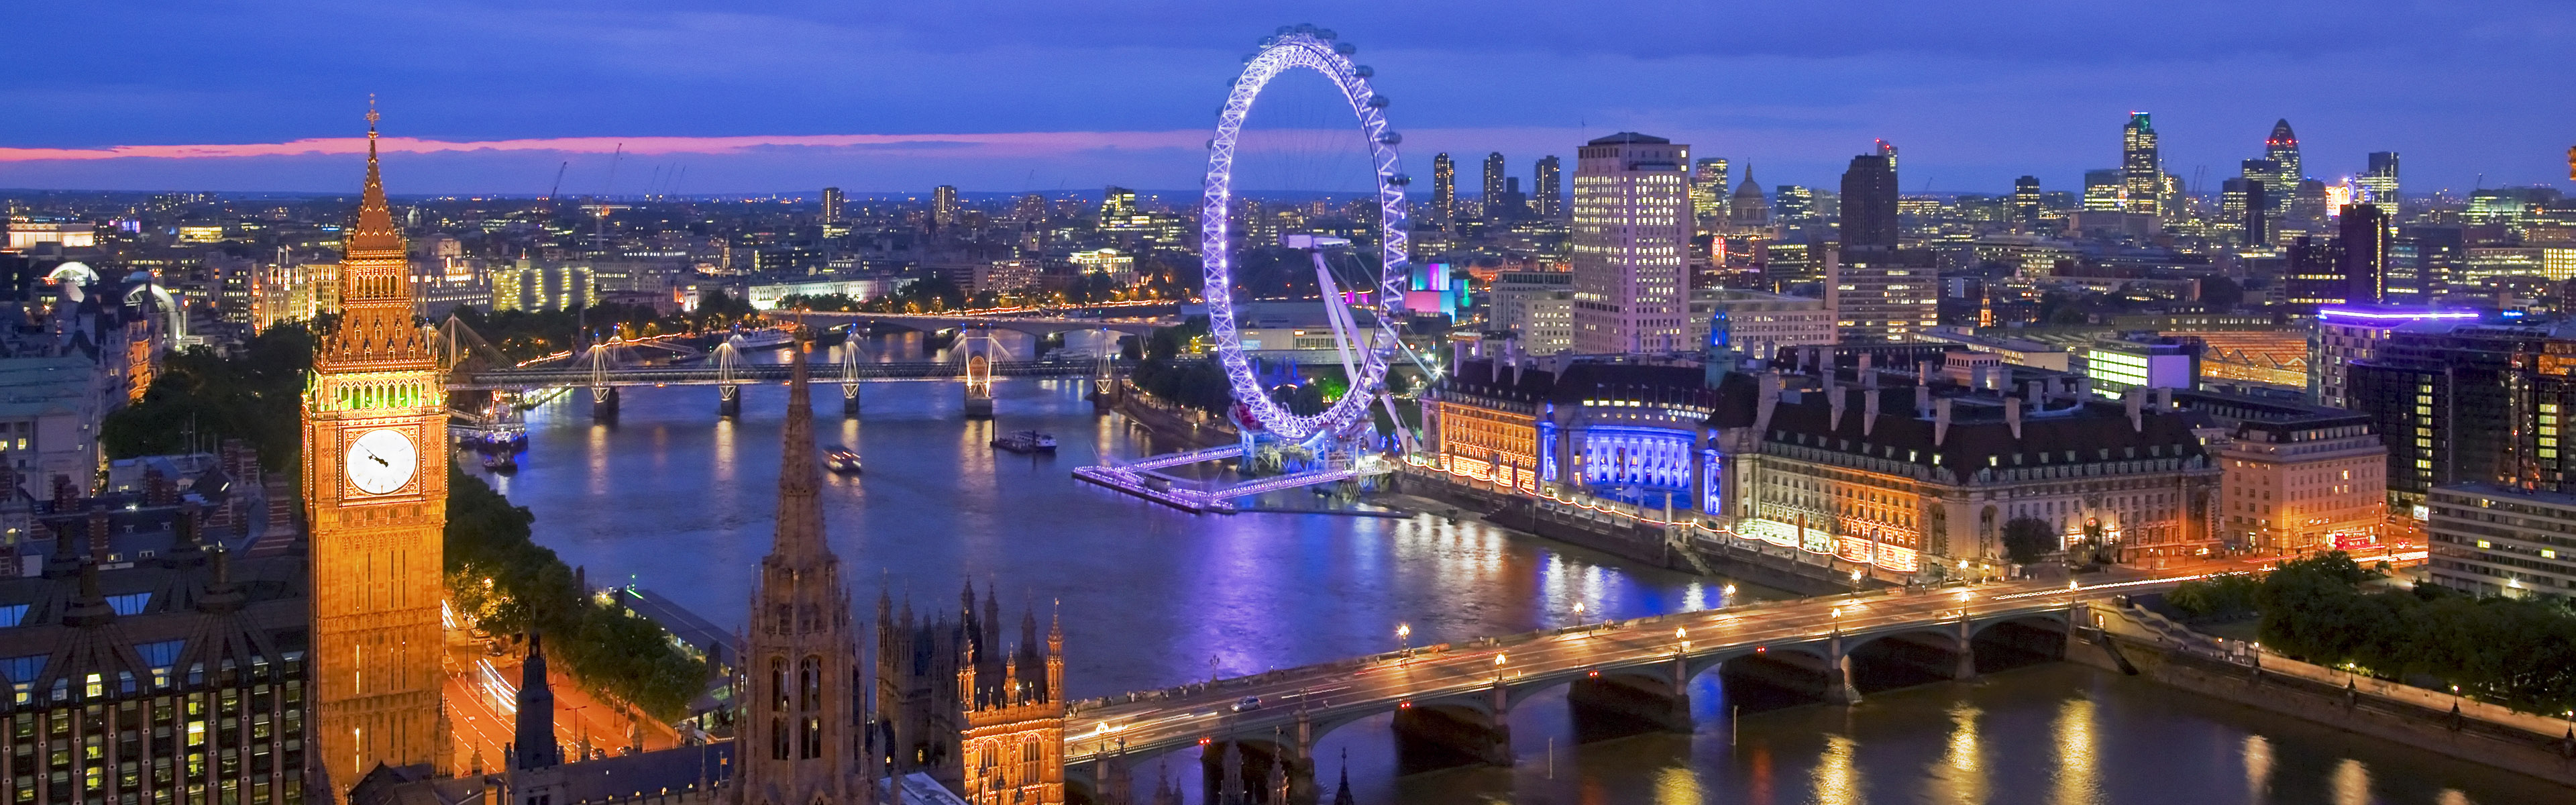 england-london-secret-world